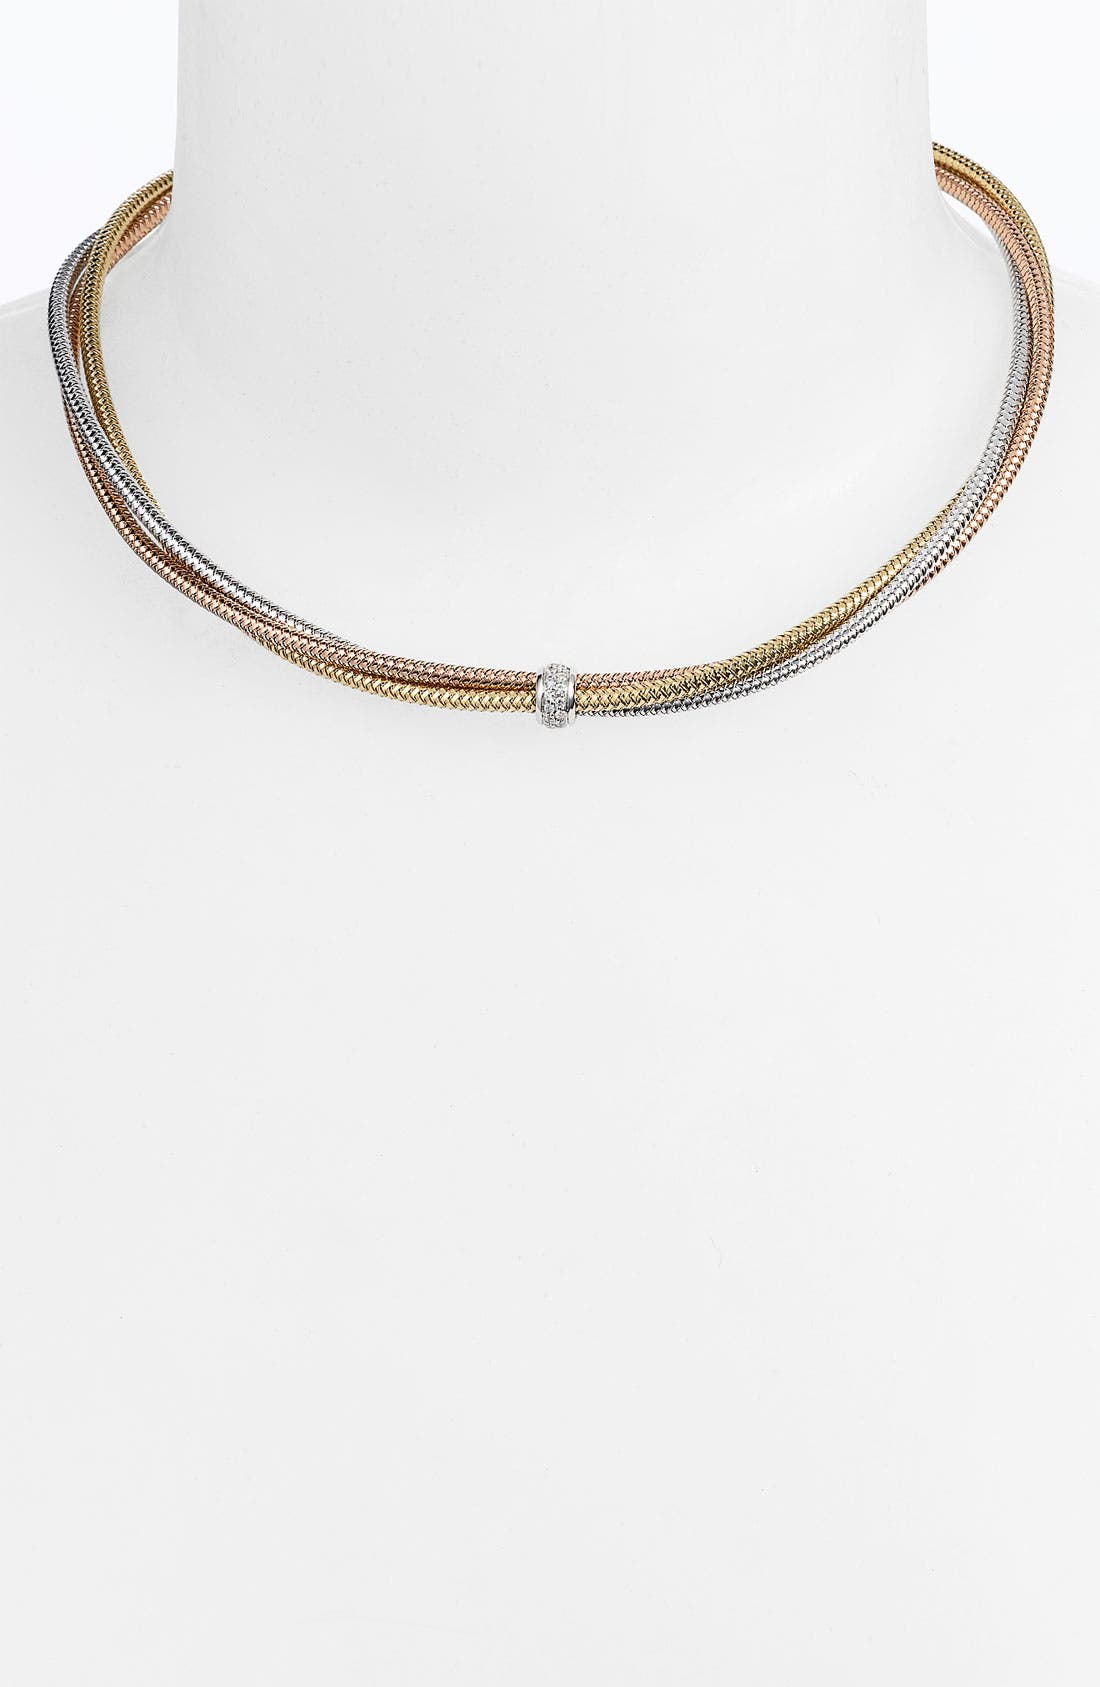 Alternate Image 1 Selected - Roberto Coin 'Mini Primavera' Triple Strand Diamond Necklace